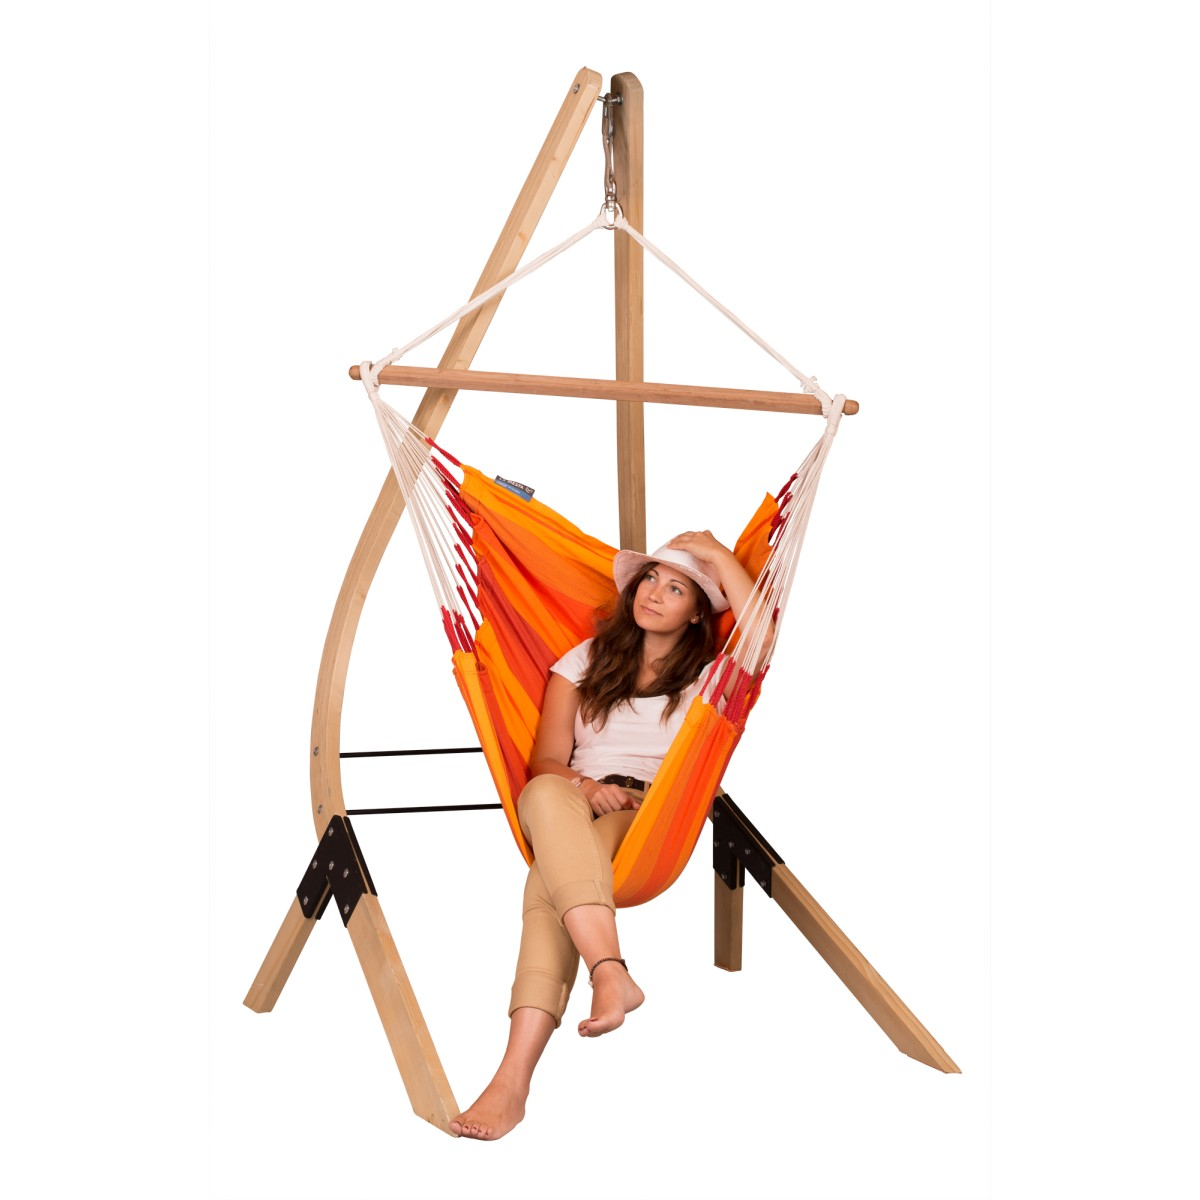 la siesta chaise hamac basic orquidea volcano support en bois vela. Black Bedroom Furniture Sets. Home Design Ideas